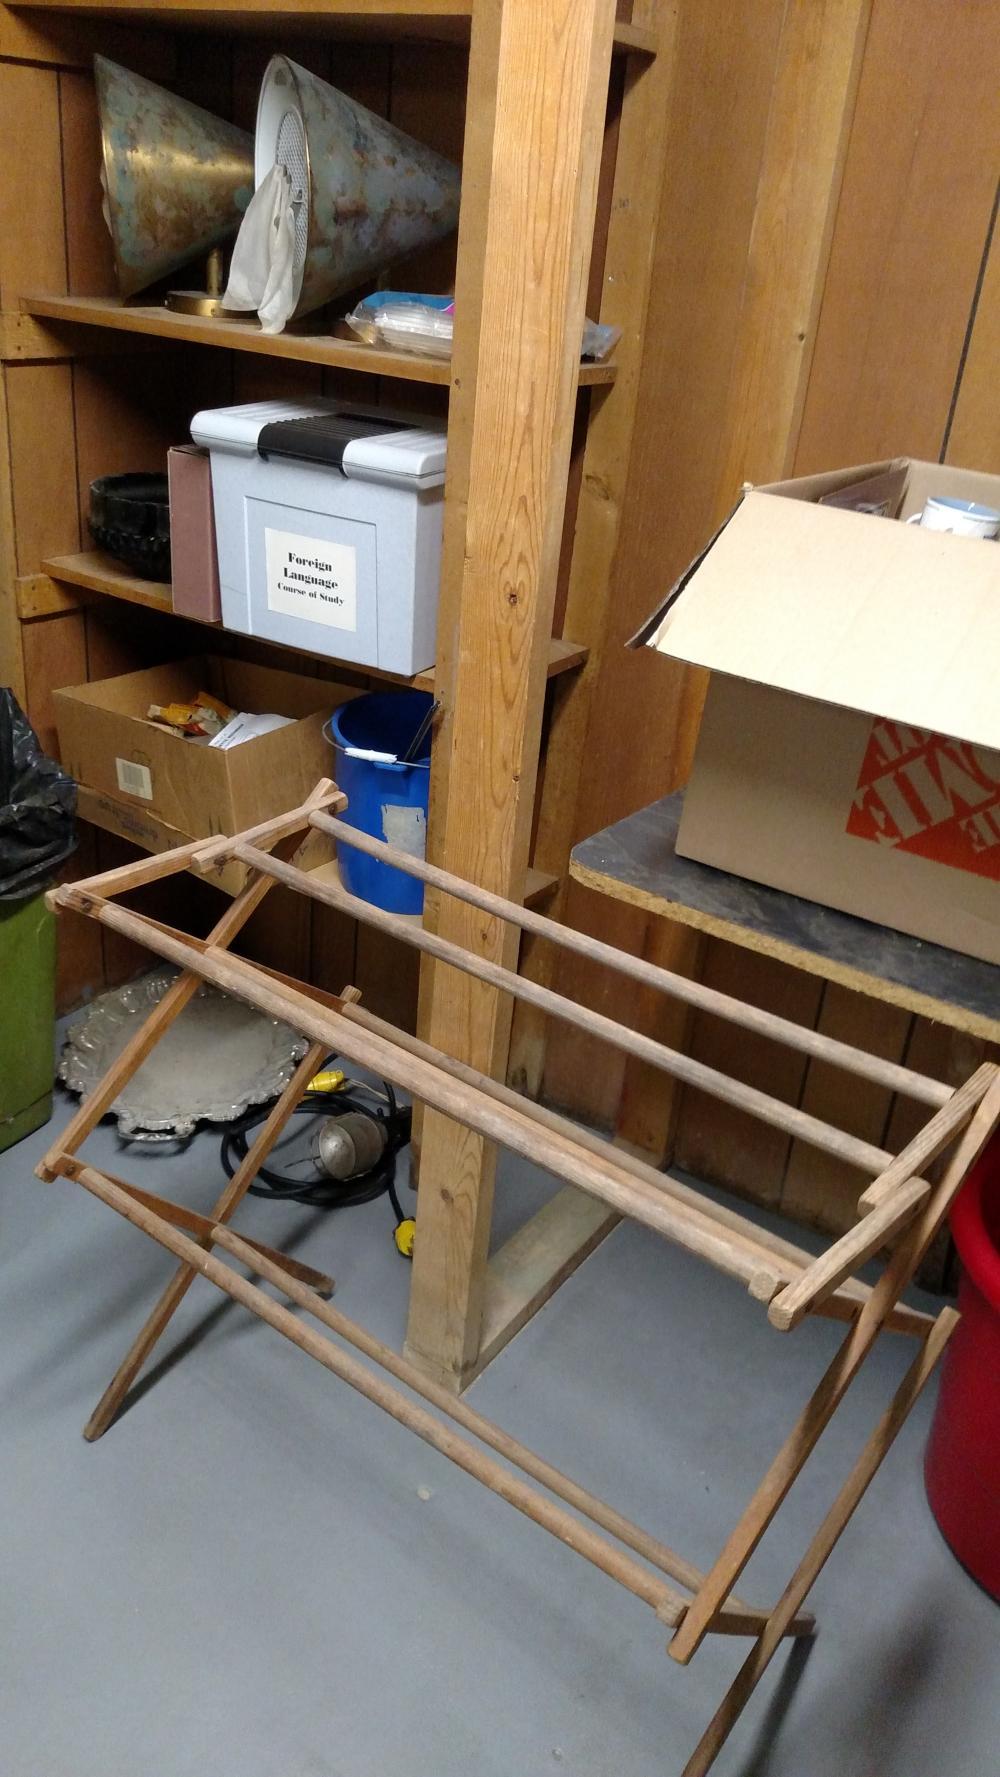 dryer rack, cone lights, misc. house wares